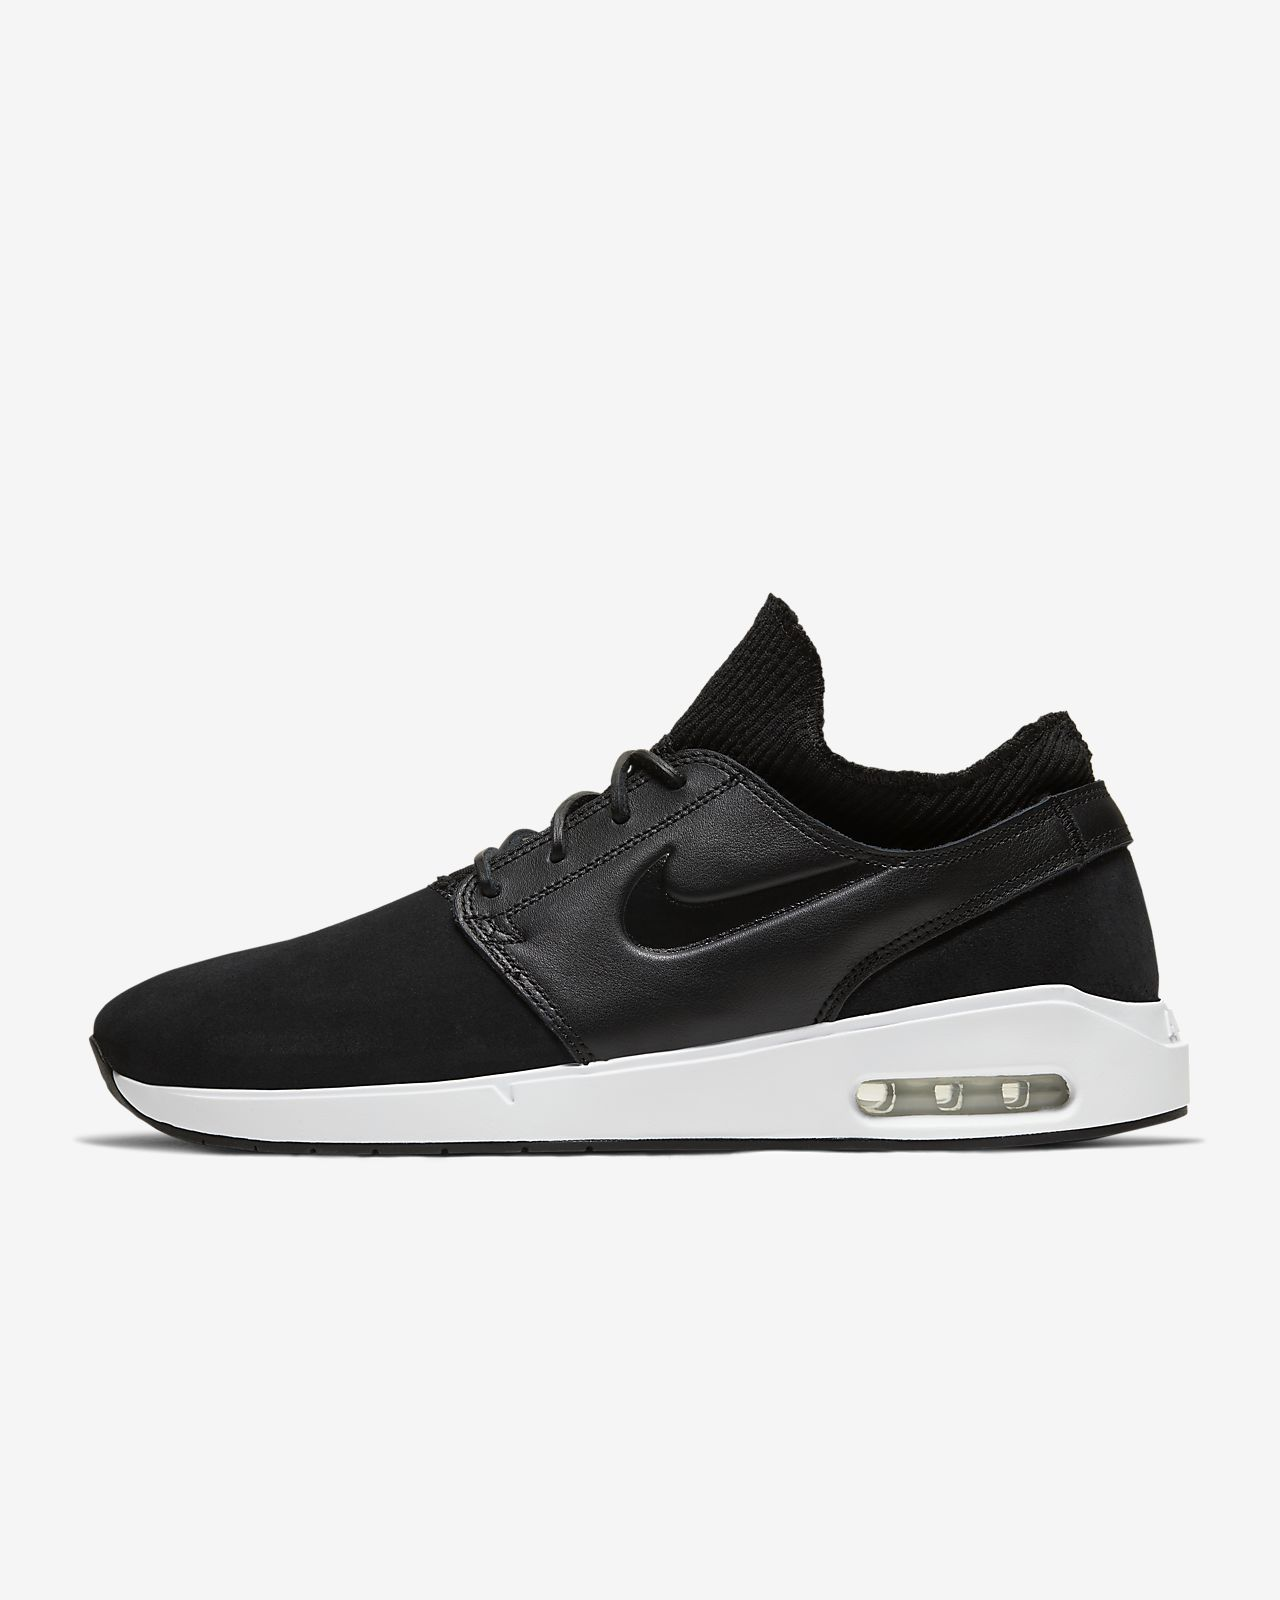 Buty do skateboardingu Nike SB Air Max Stefan Janoski 2 Premium